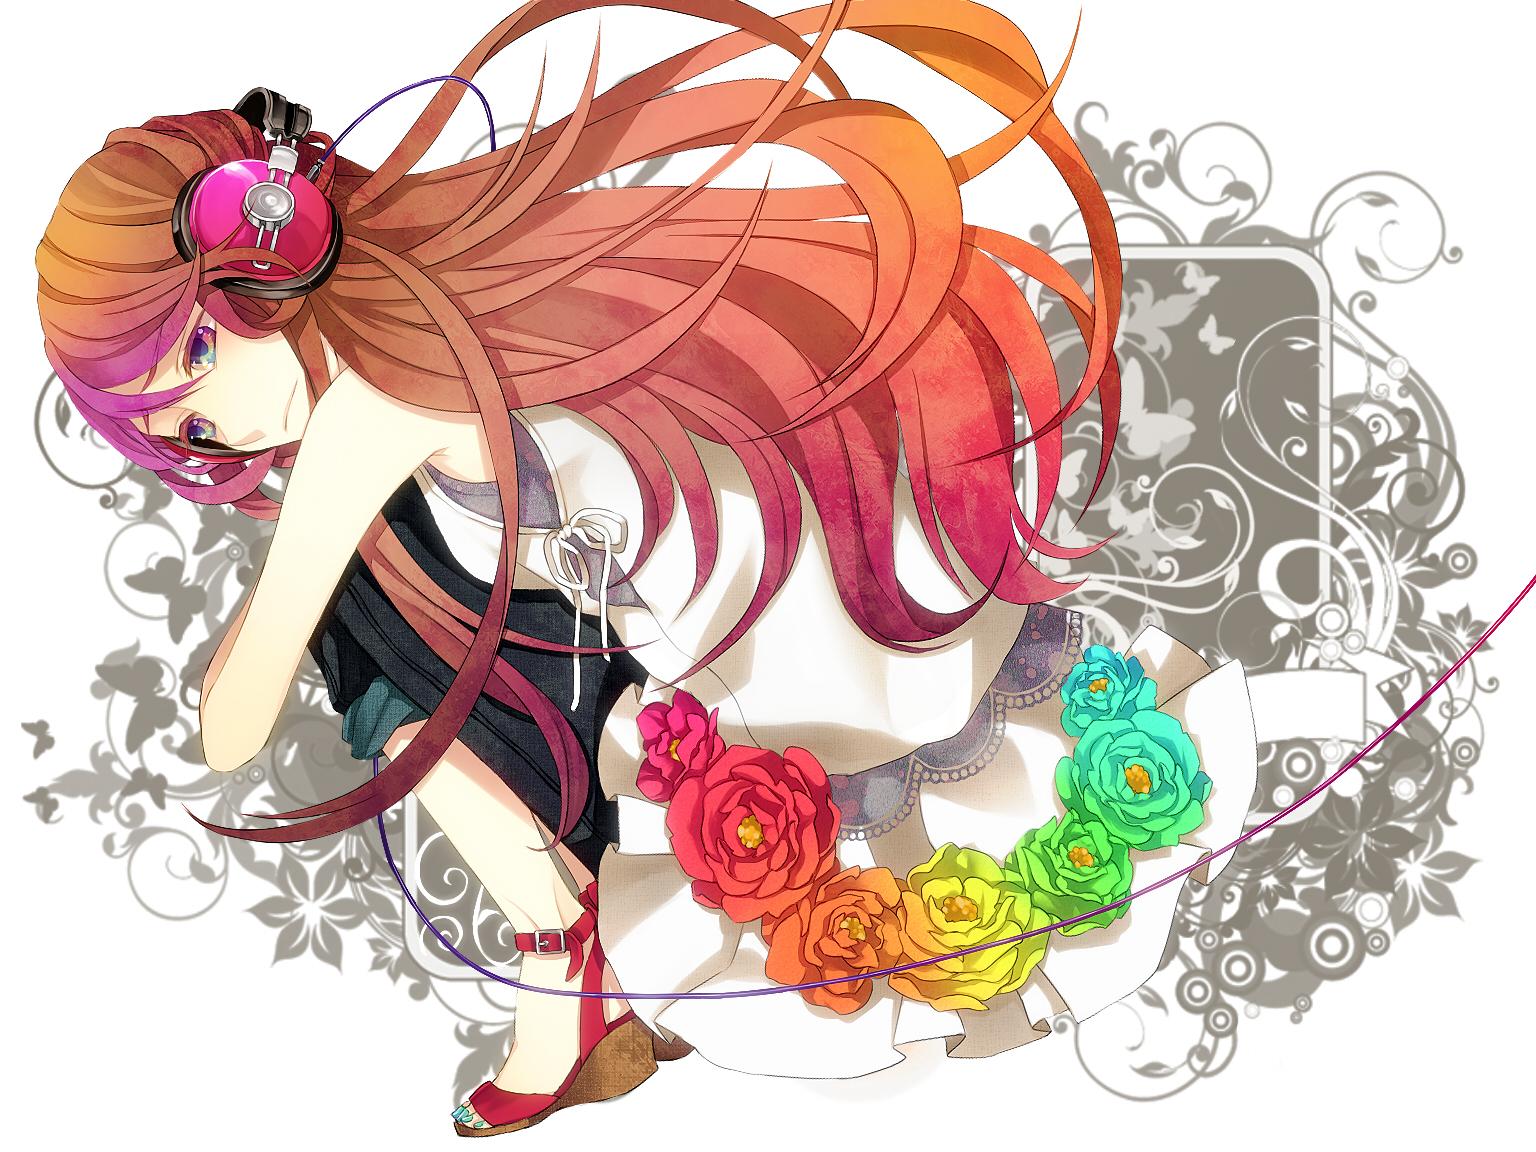 Keep Only One Love 8 Prince Wallpaper 229978 Zerochan Anime